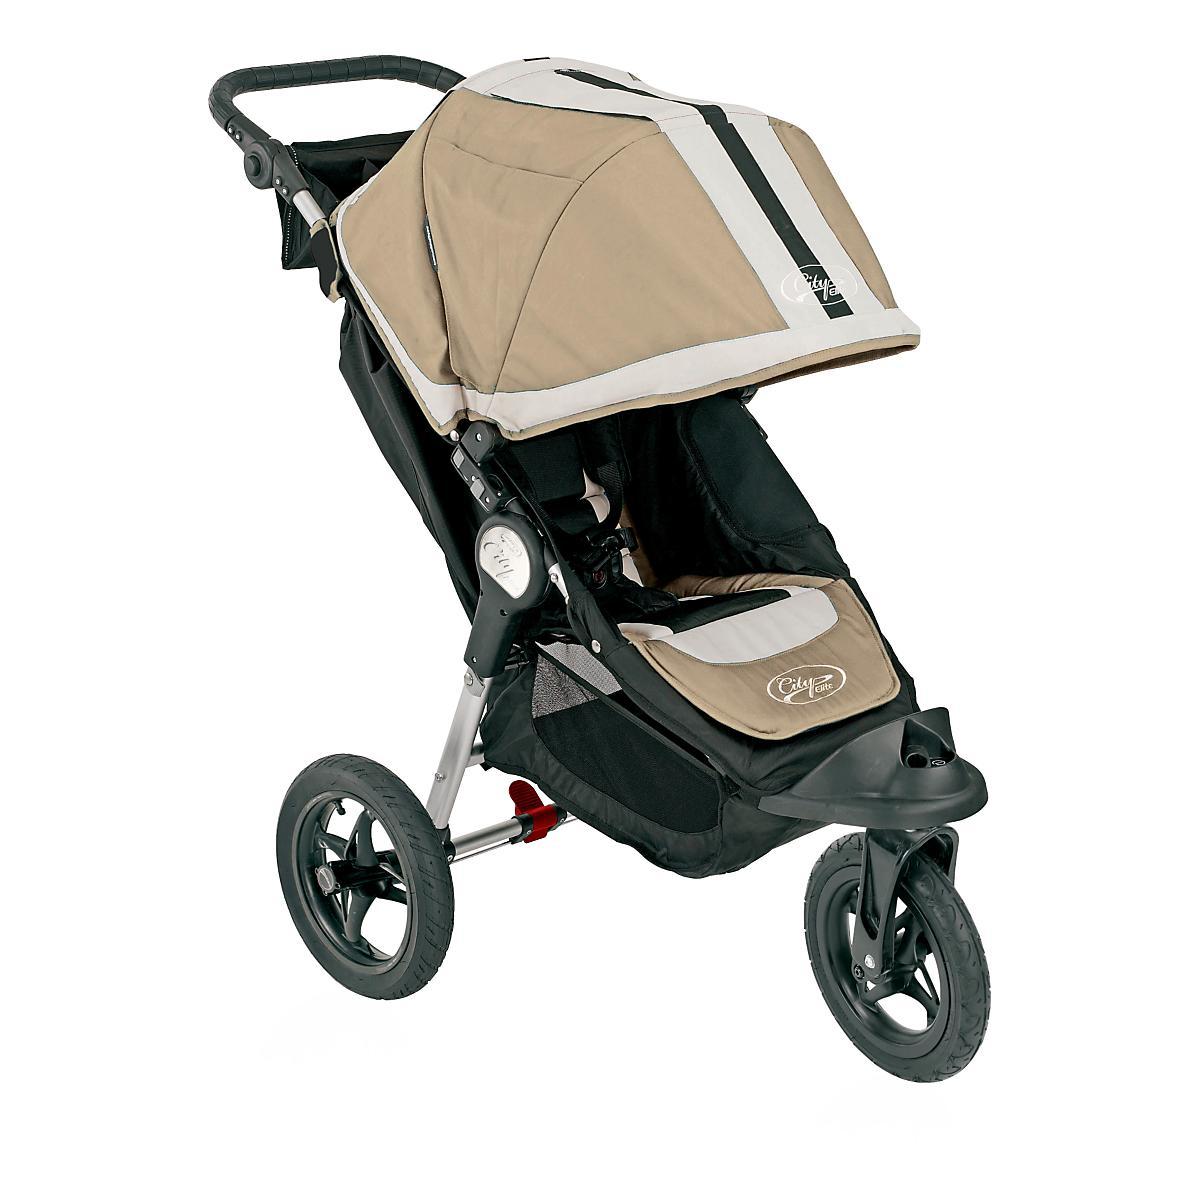 Baby Jogger City Elite Single Stroller at Road Runner Sports